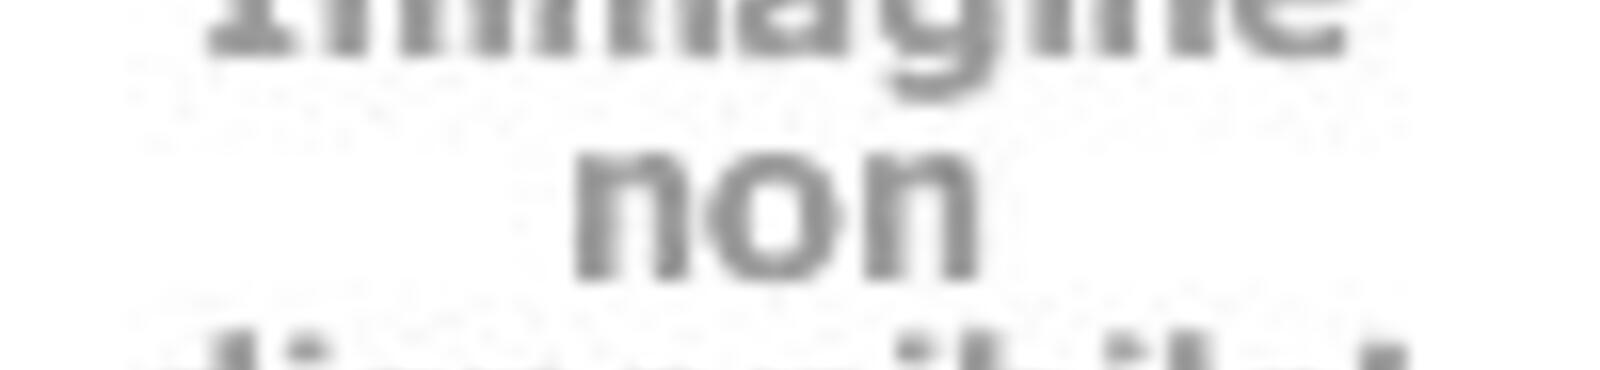 petronianaviaggi it roma-...-una-storia-ultramillenaria-...-imperatori-papi-ed-ebrei-v379 002